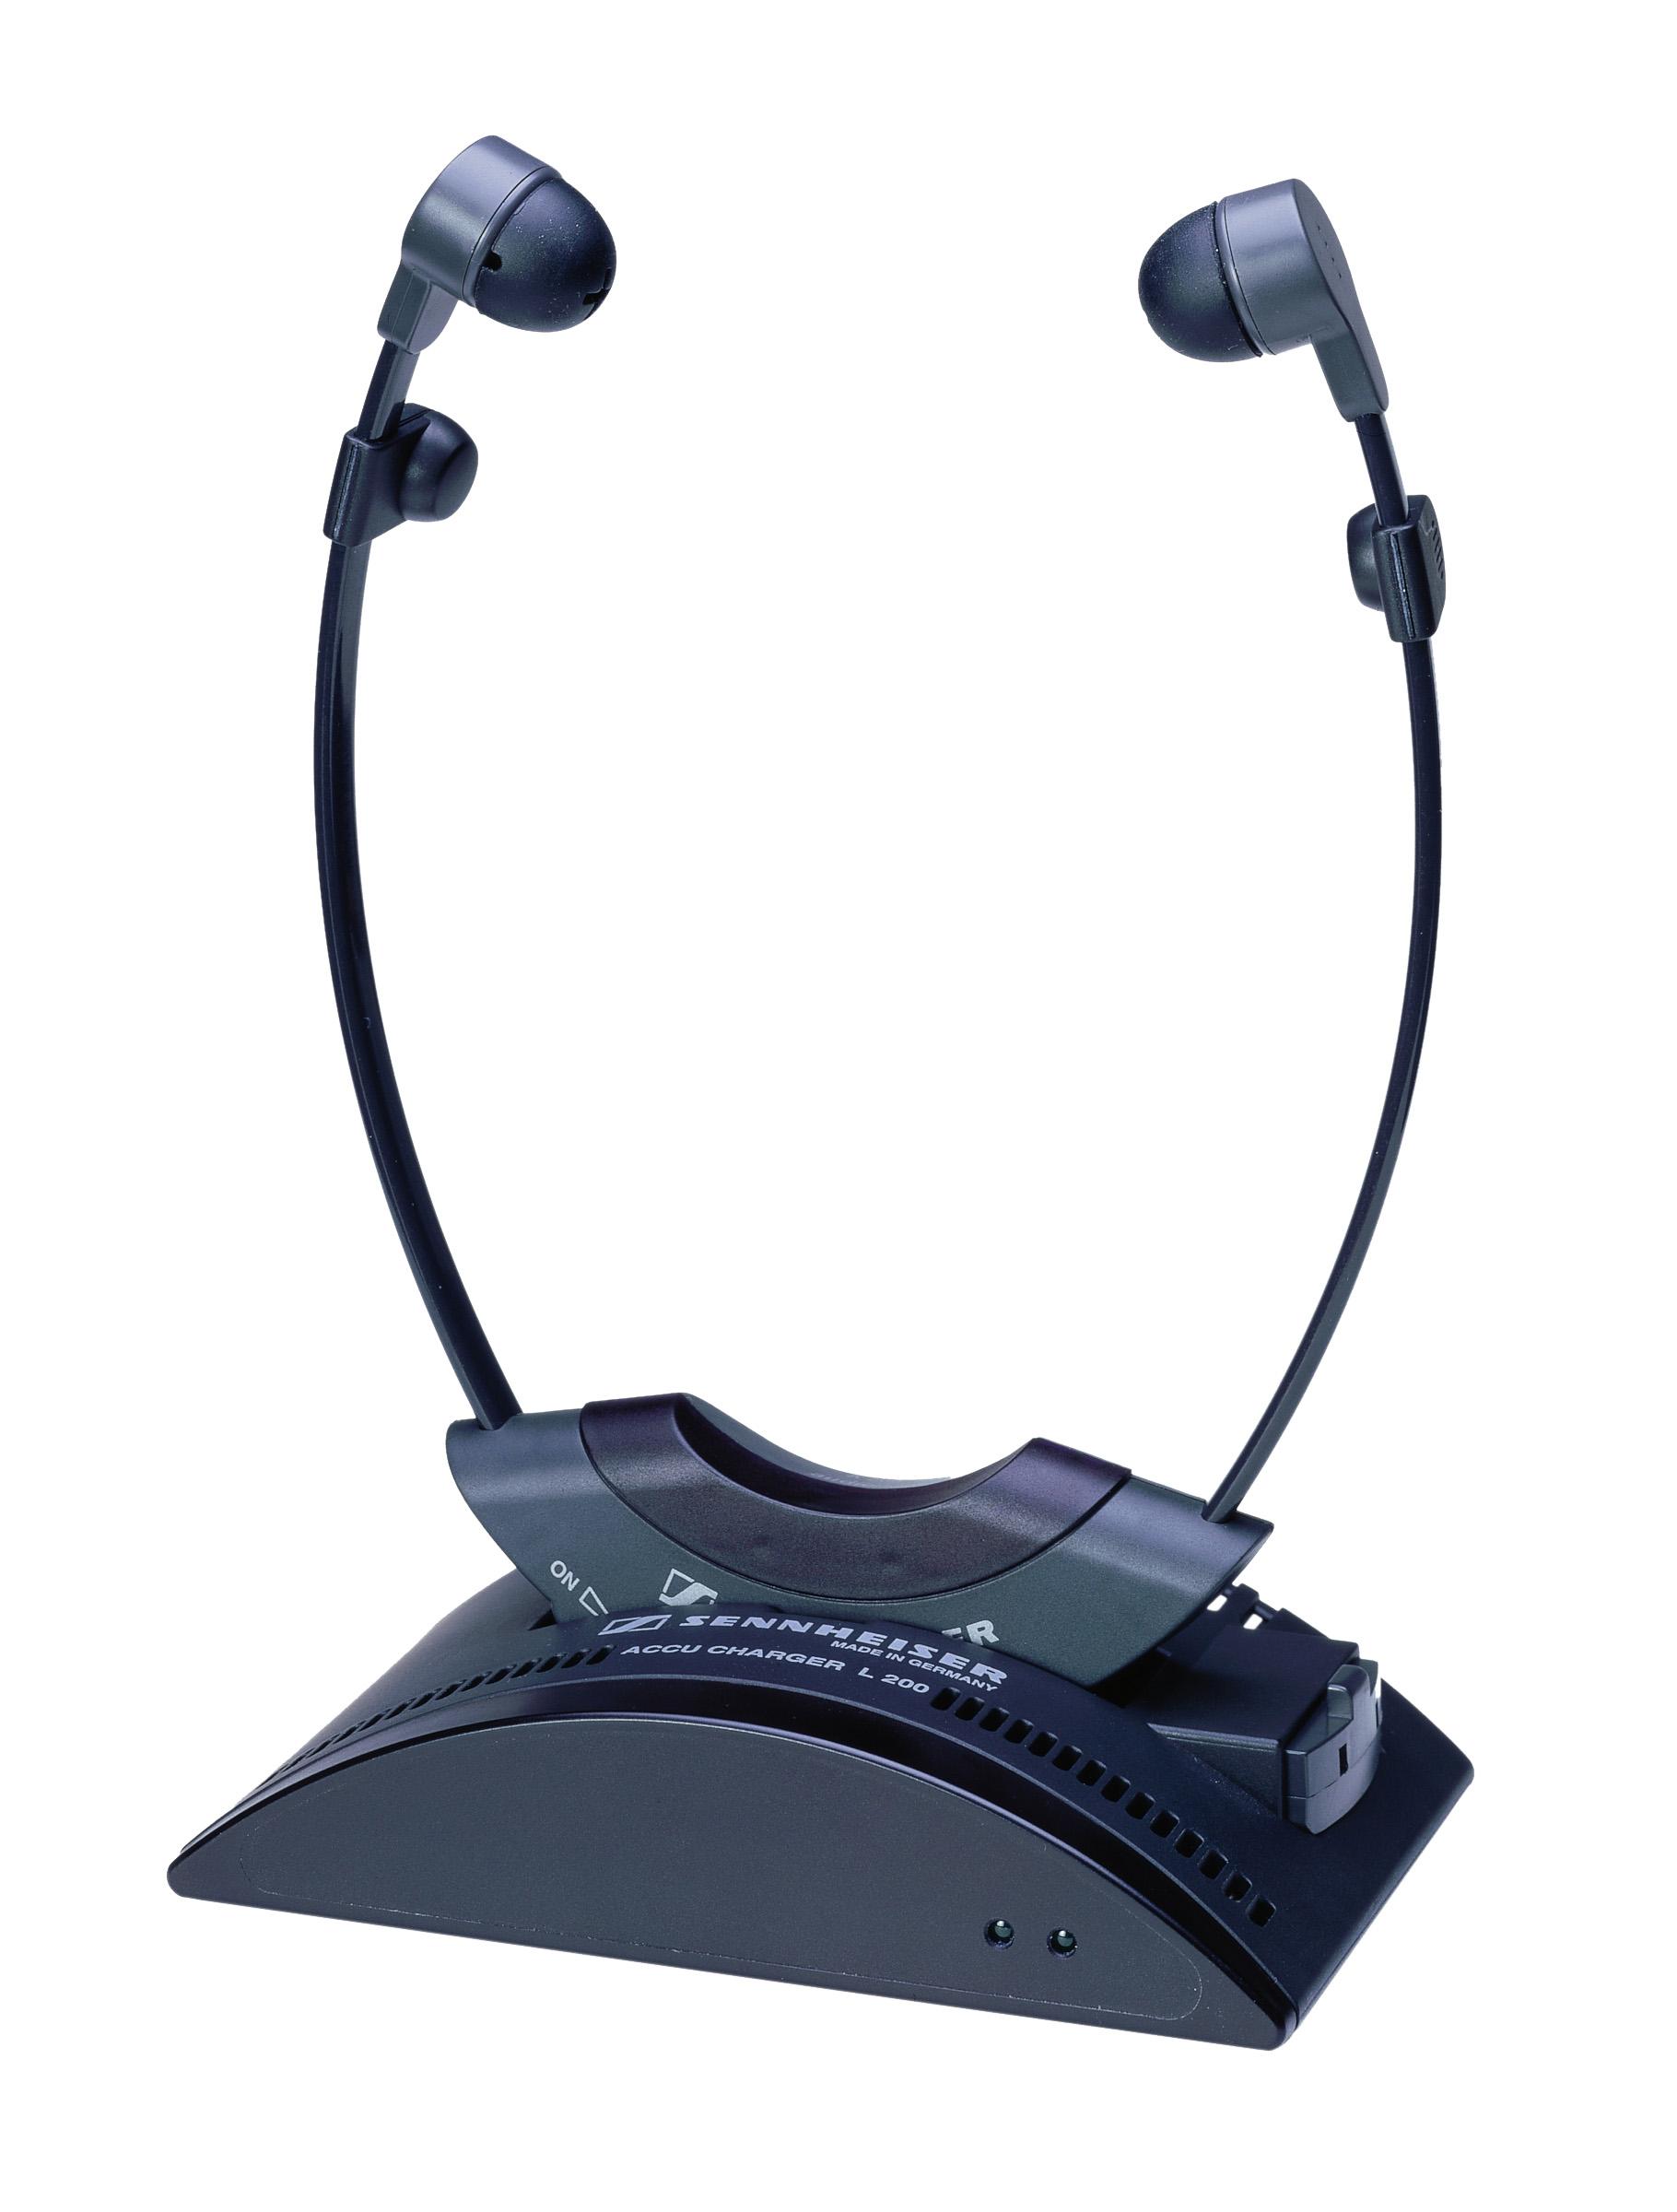 Sennheiser Stereo Tv Listening Sound Amplifier A 200